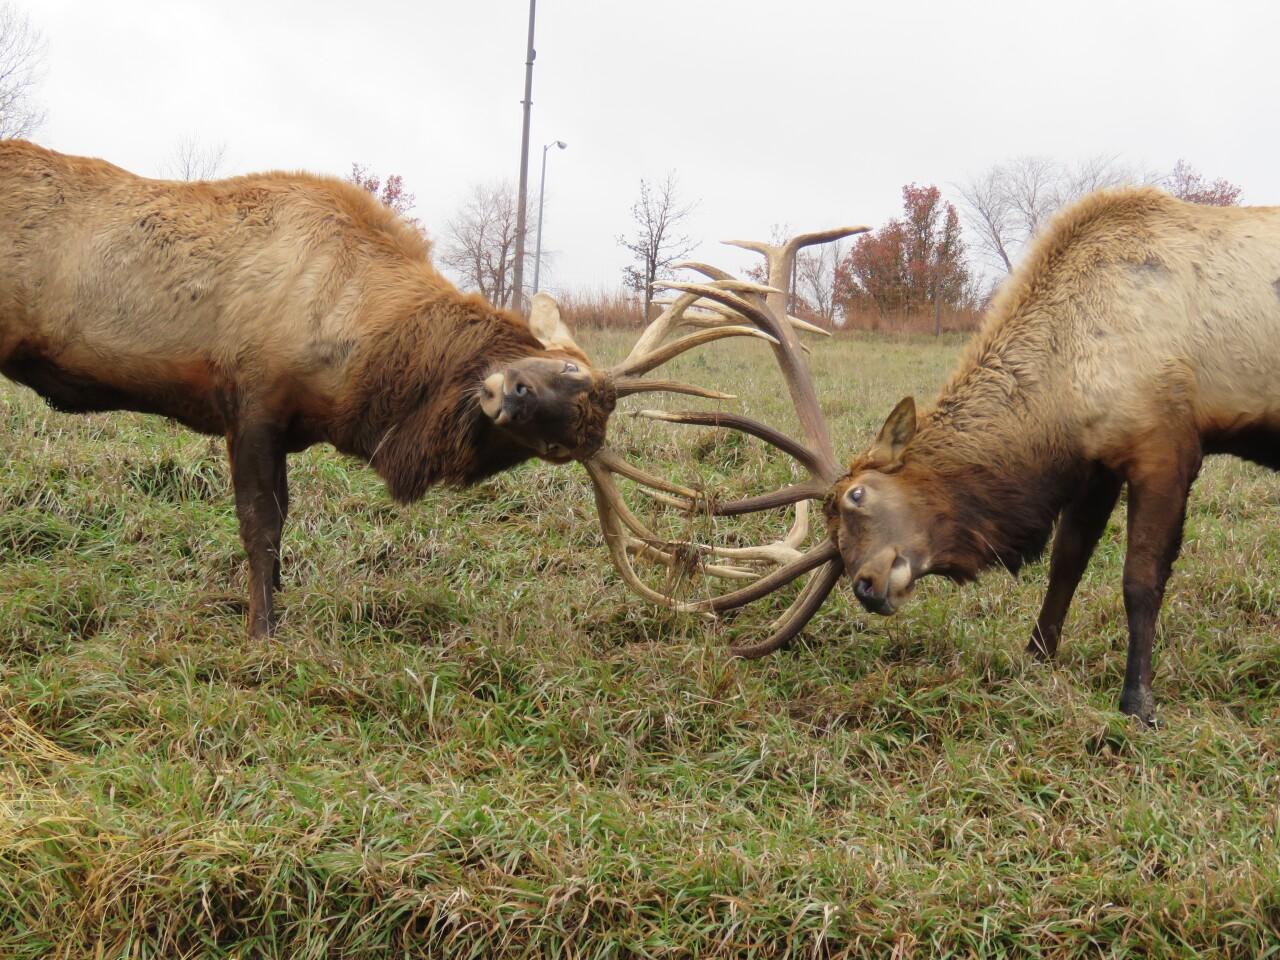 Elk rutting at Simmons Wildlife Park